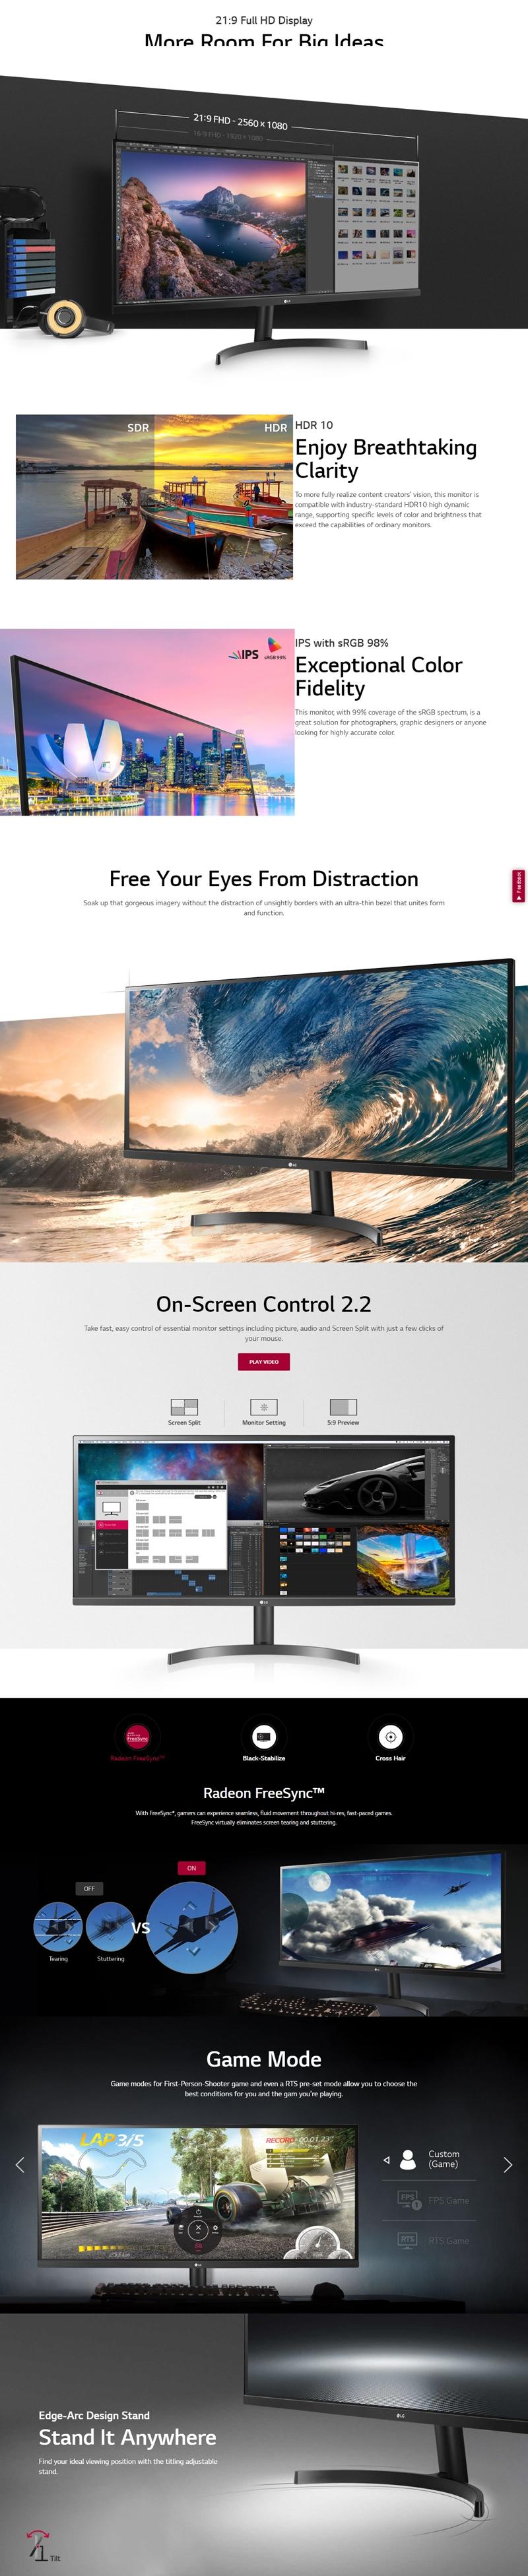 screencapture lg us monitors lg 34wl500 b 2019 09 05 14 57 24